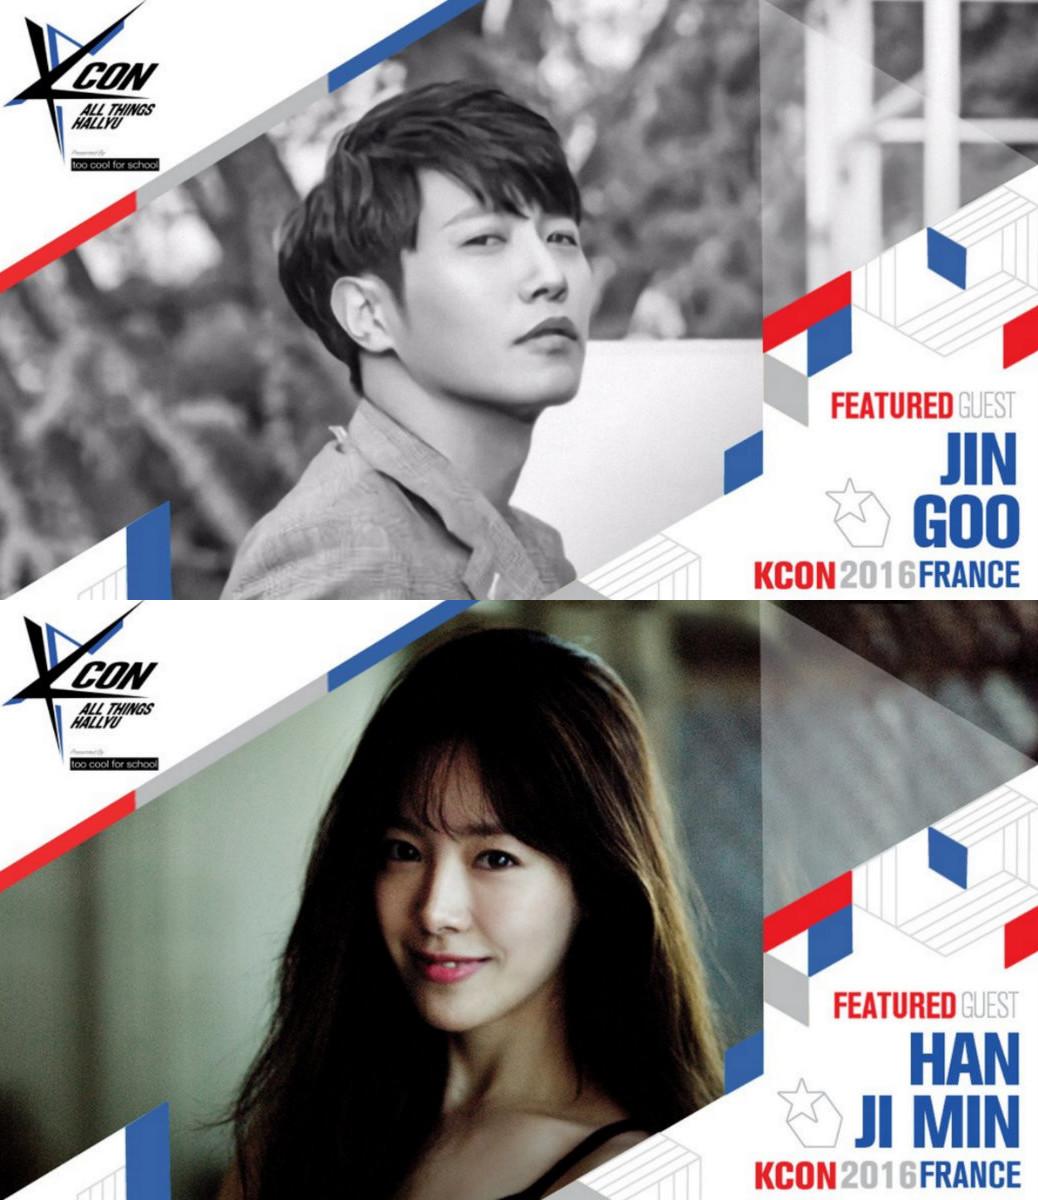 Jin Goo and Han Ji Min Head To France for KCON 2016